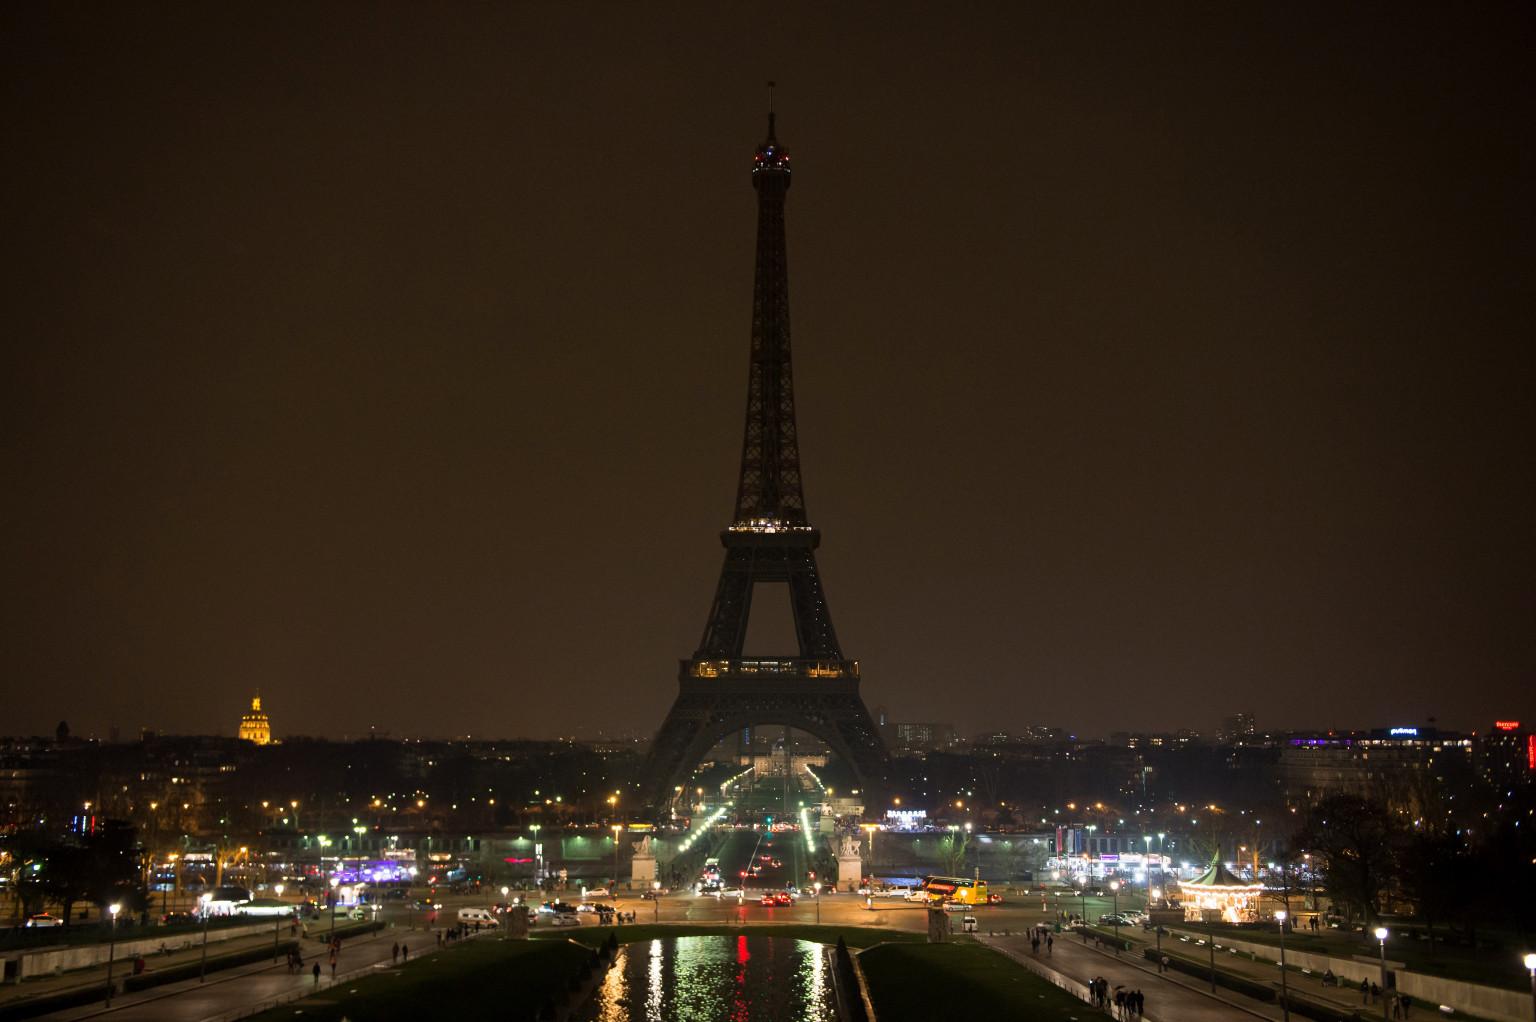 Paris illumination ban 39 city of light 39 begins turning off its lights - Illumination a paris ...